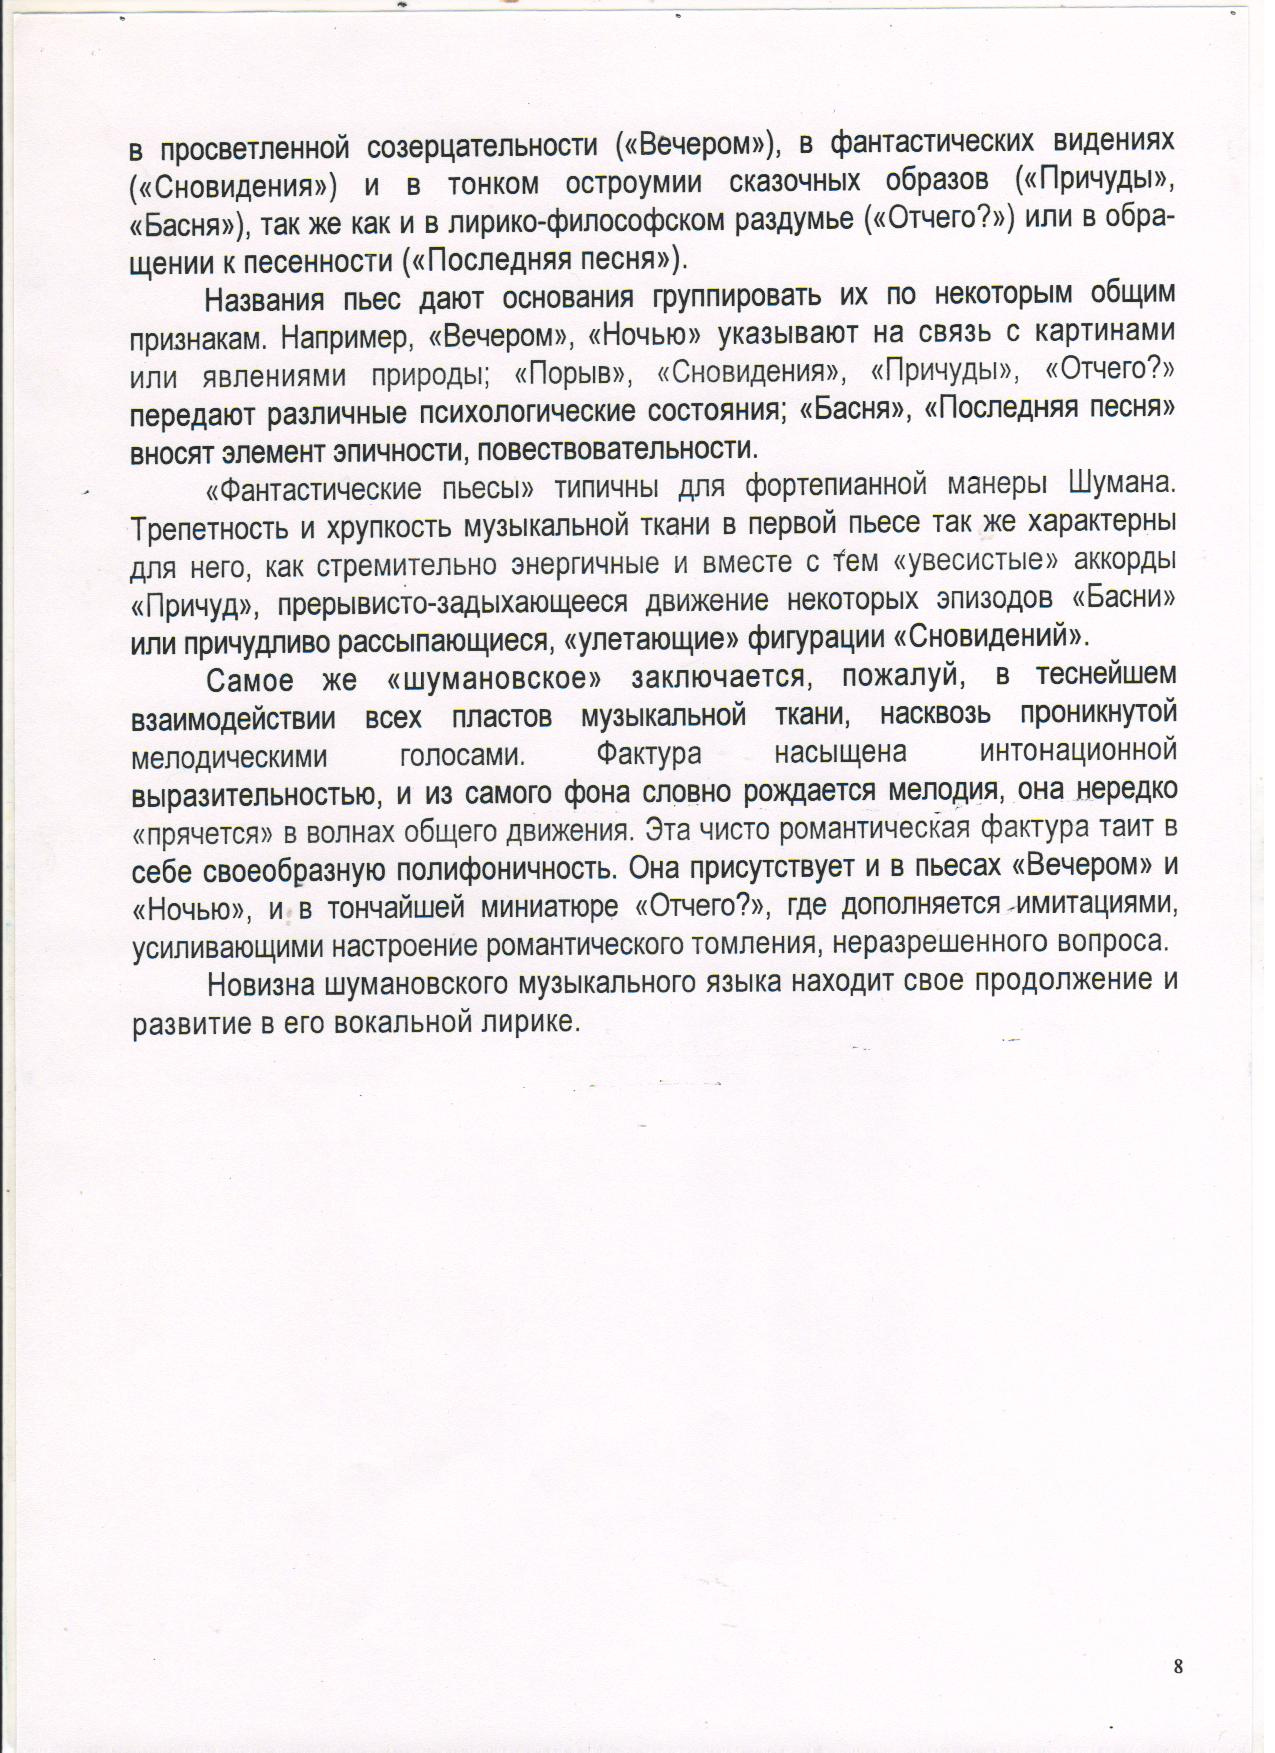 C:\Documents and Settings\Учитель\Рабочий стол\Шуман 8.jpg